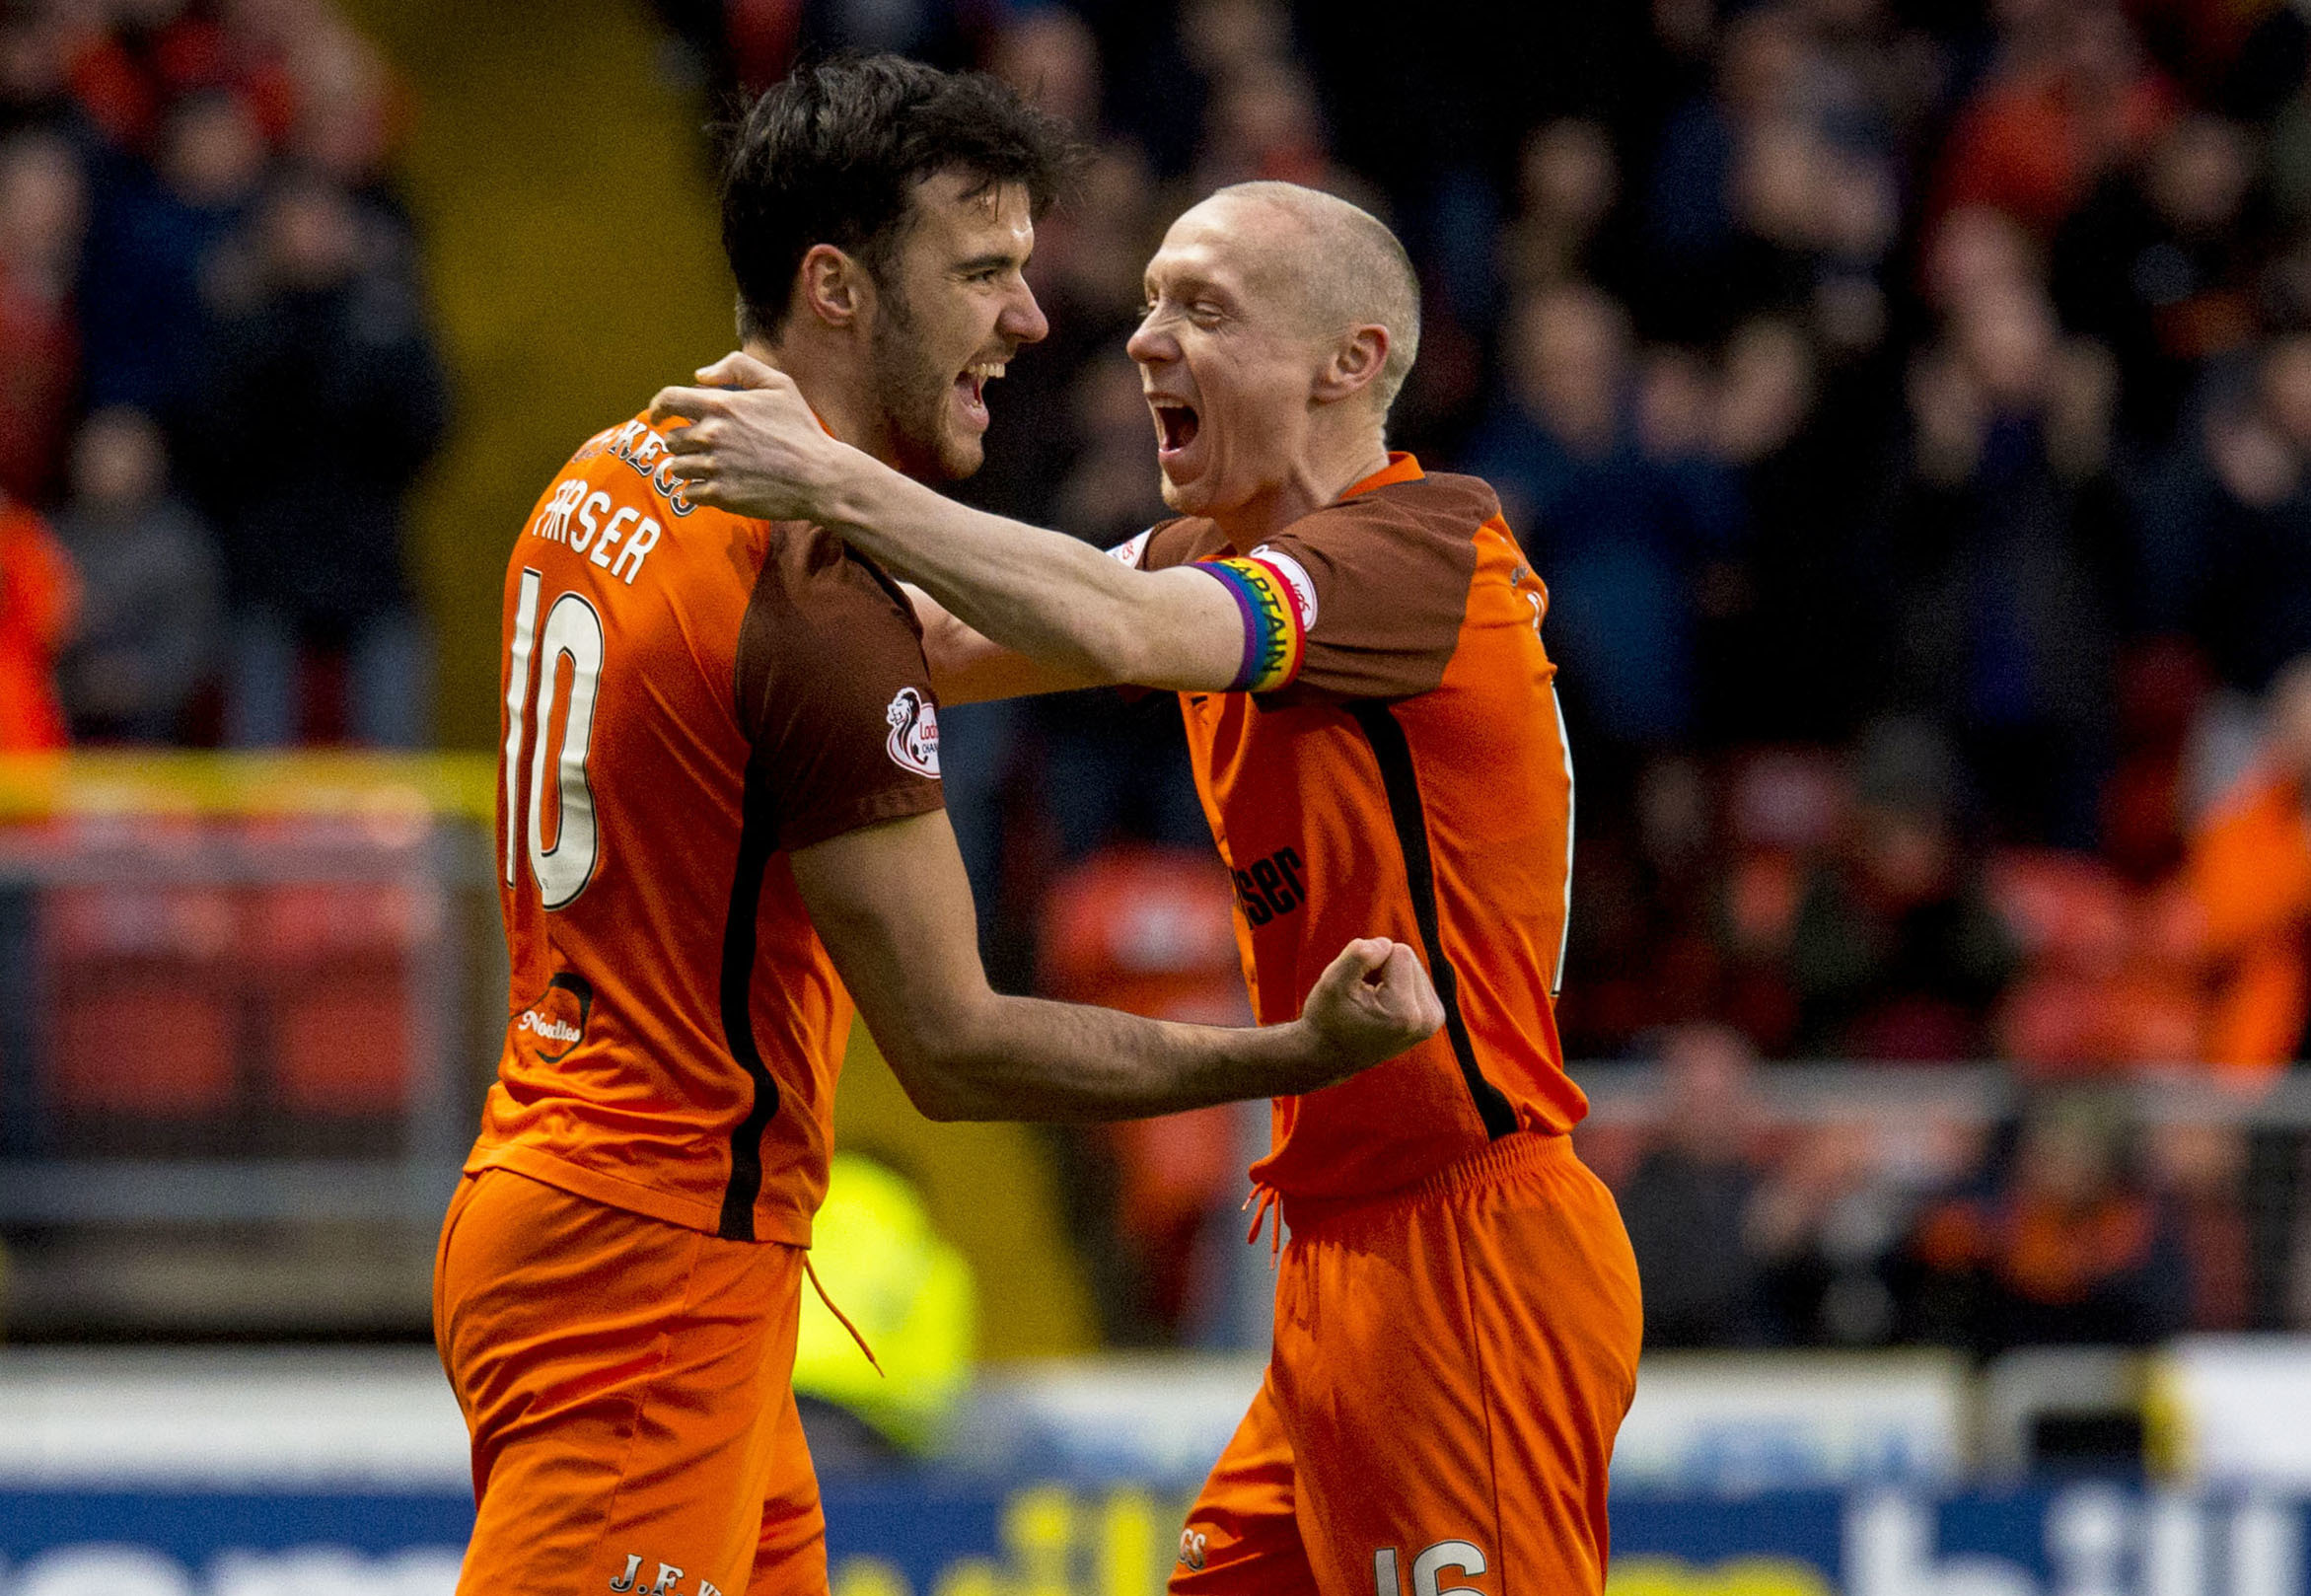 02/12/17 LADBROKES CHAMPIONSHIP   DUNDEE UTD V DUNFERMLINE  TANNADICE - DUNDEE  Dundee Utd's Scott Fraser (L) celebrates his goal with Willo Flood